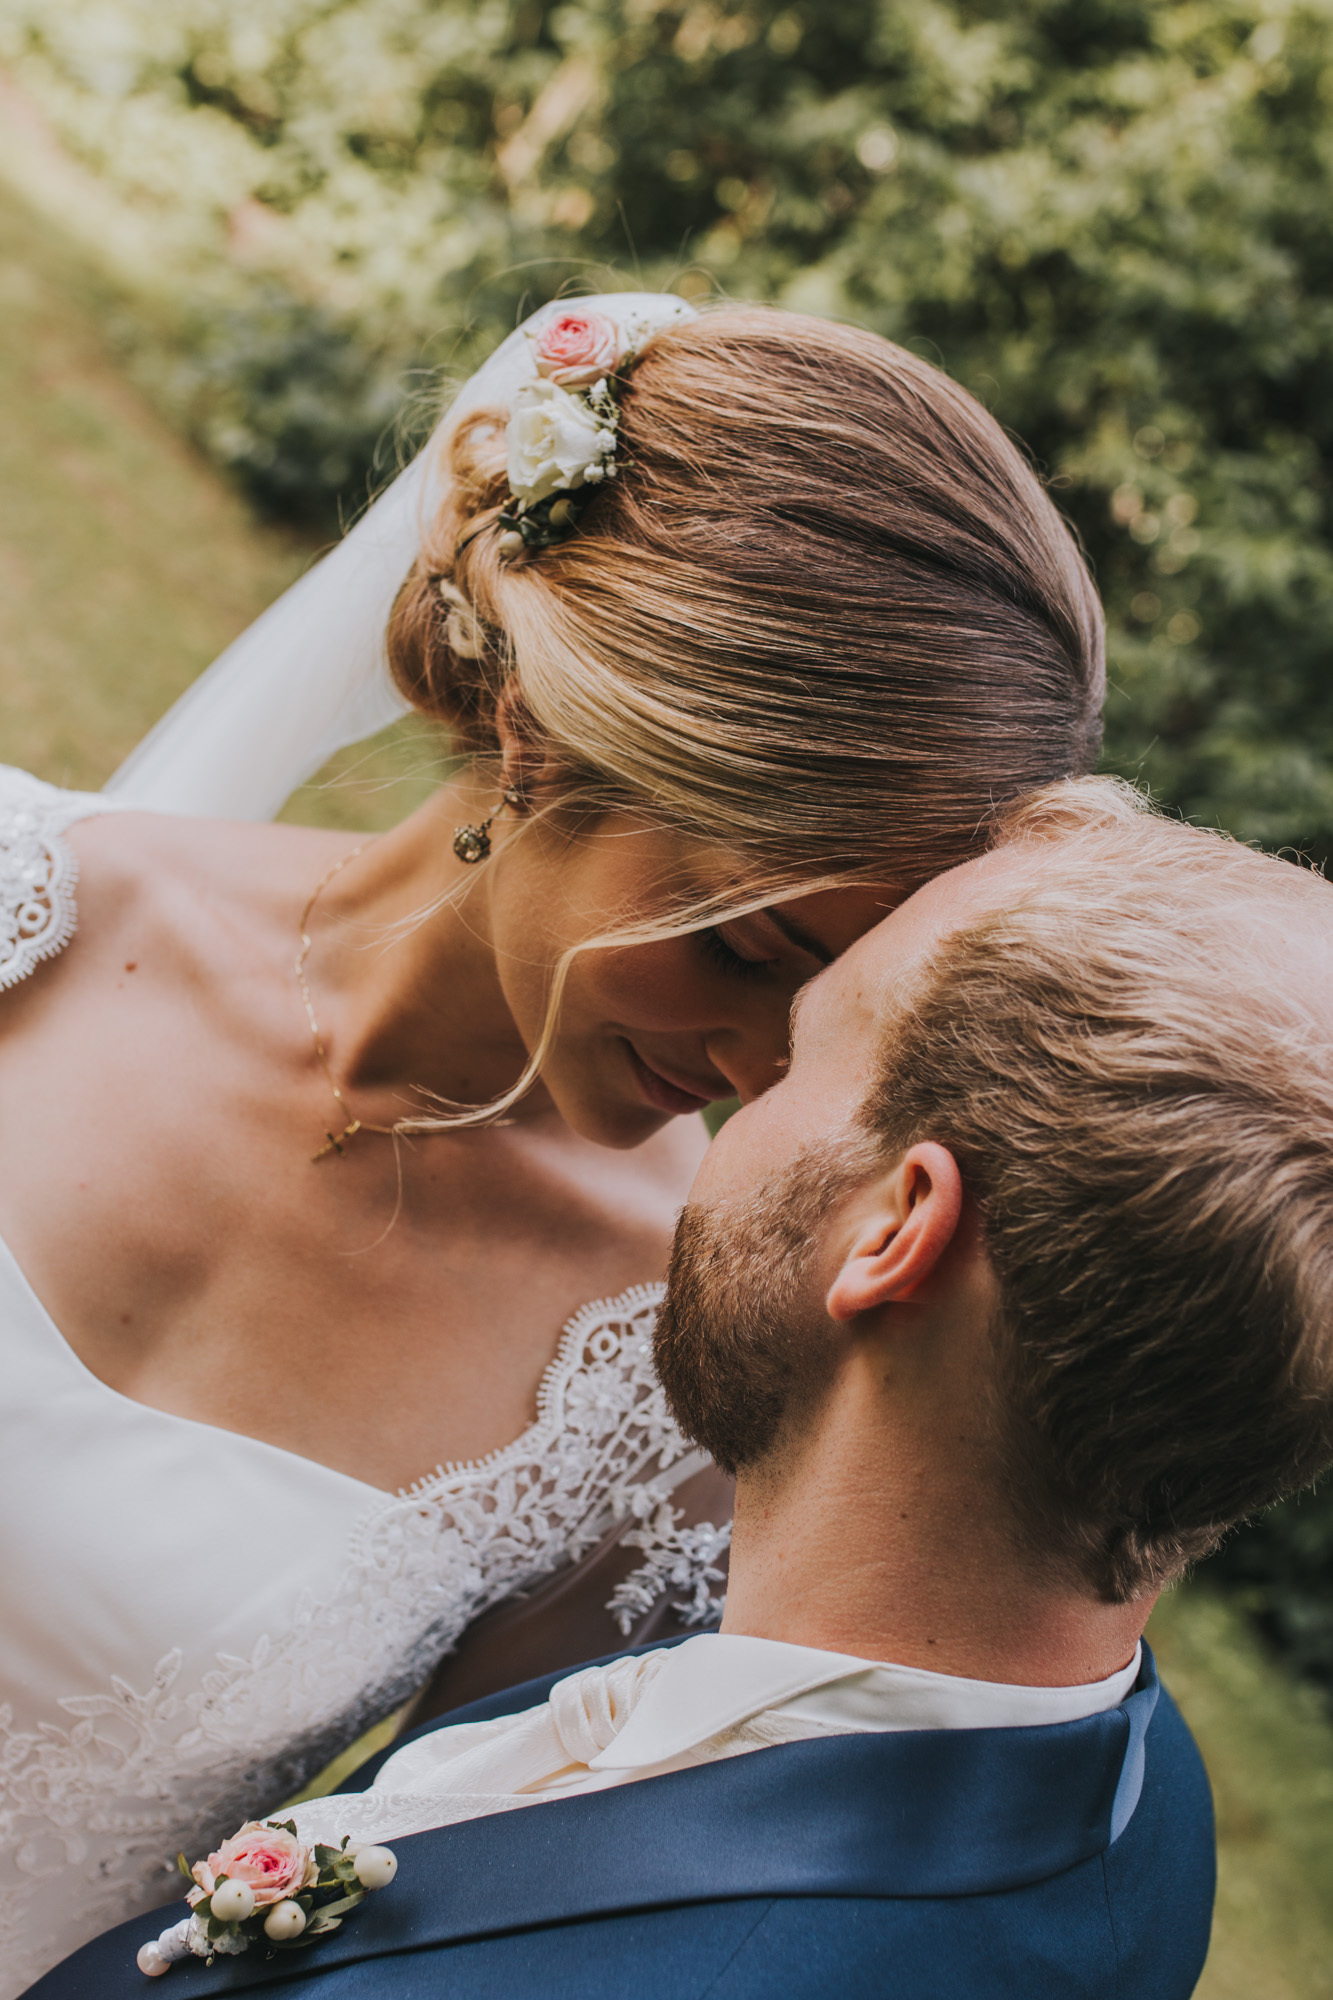 Hochzeit - Memory factory - 20180616-0045.jpg